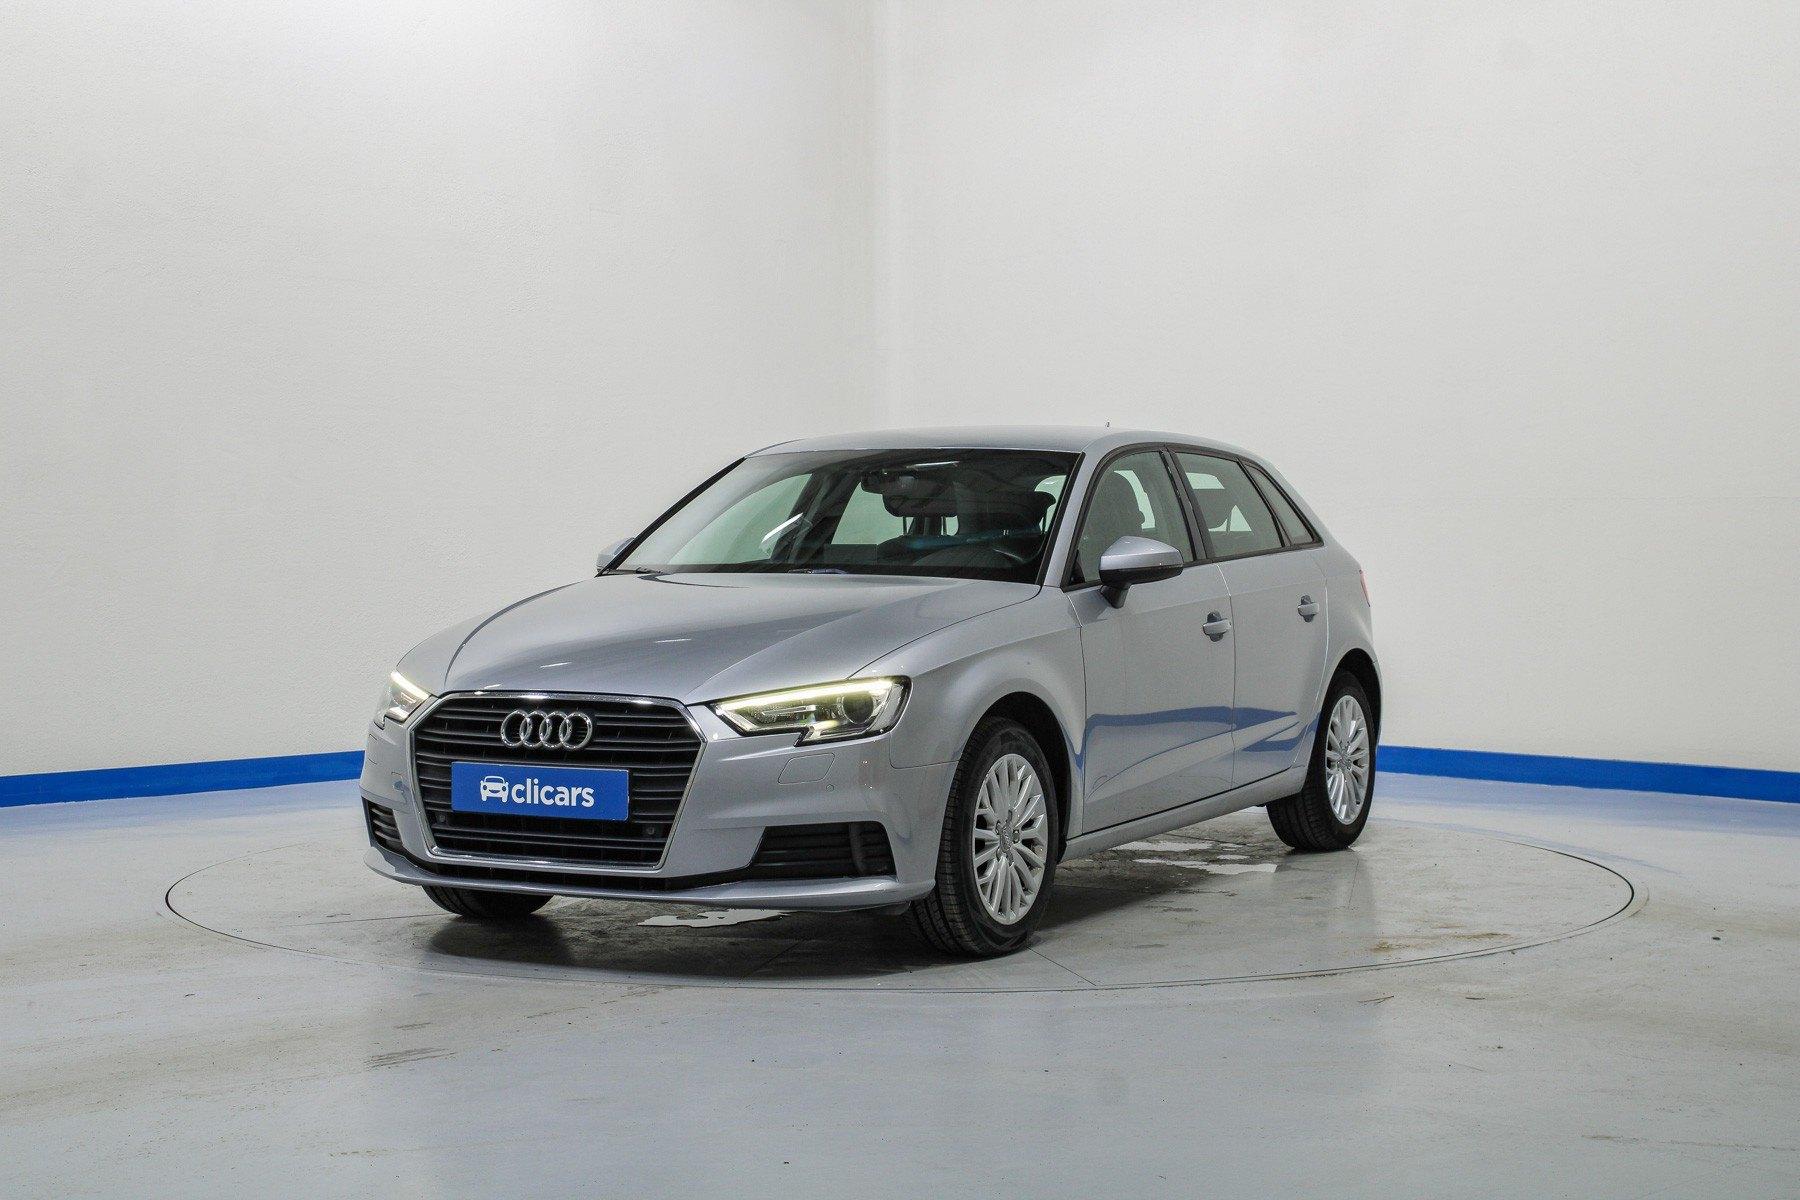 Audi A3 Gasolina 1.4 TFSI CoD ultra Sportback 1